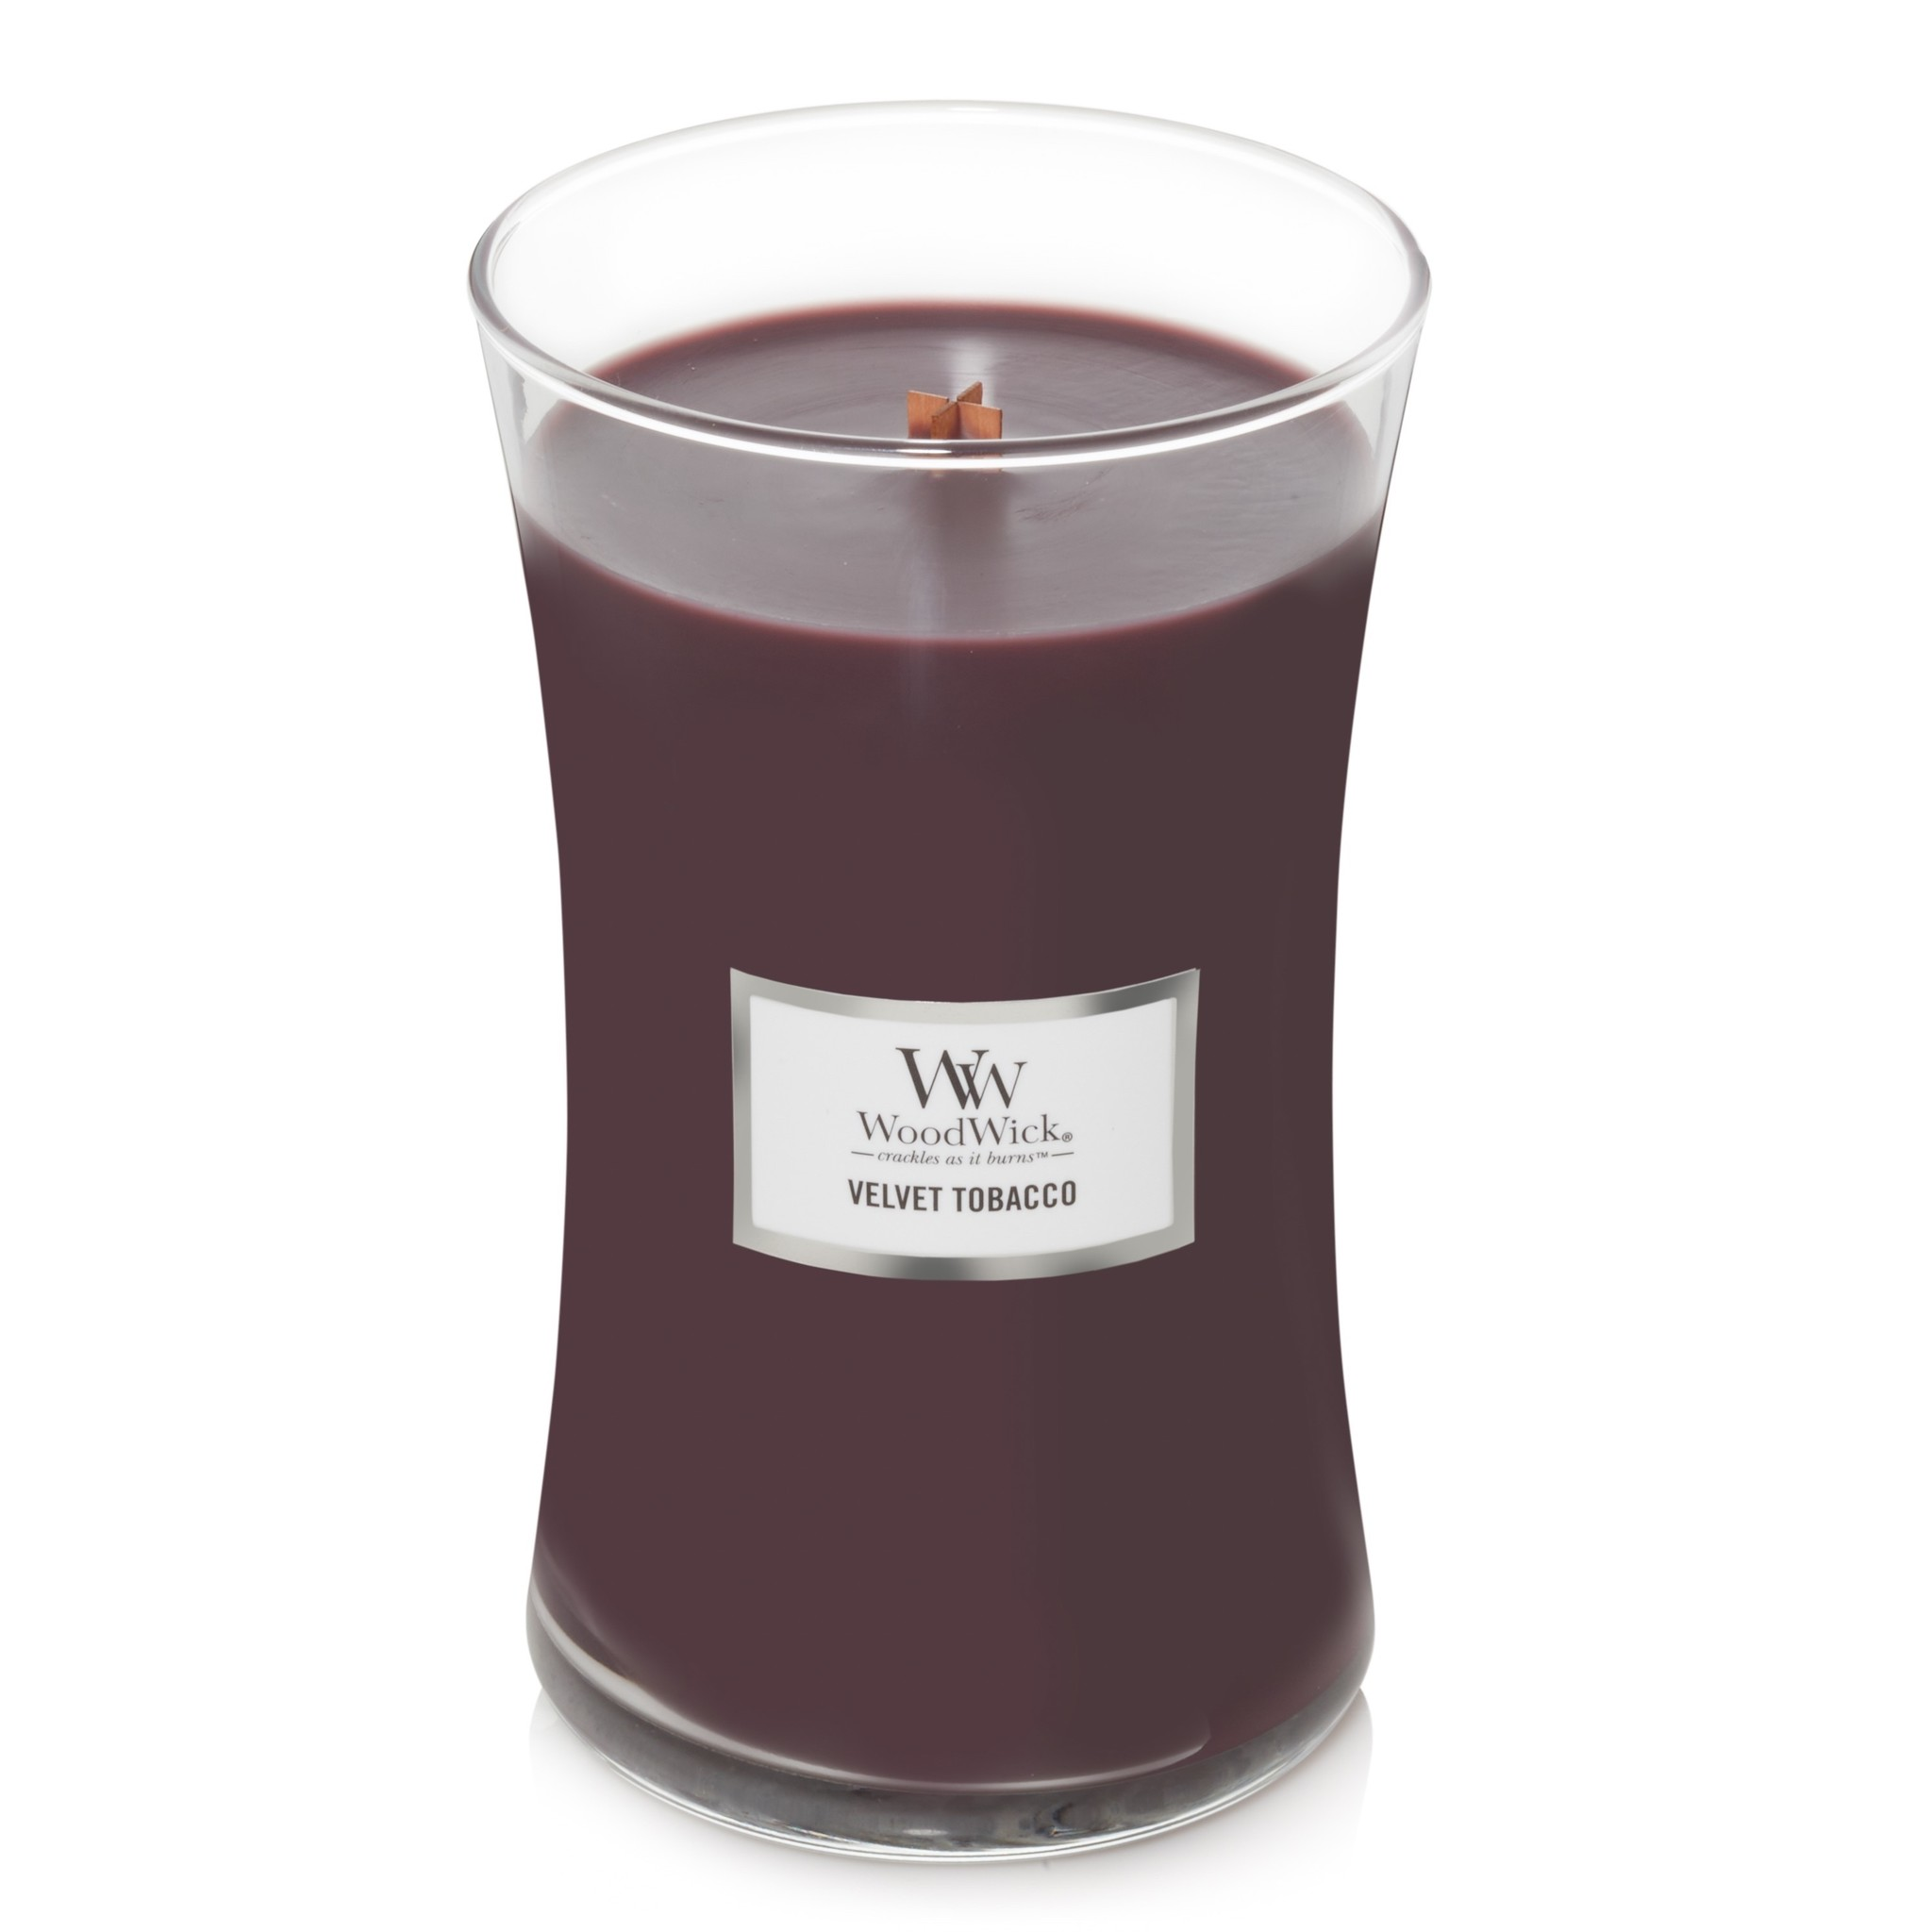 WOODWICK bougie  velvet tobacco large-2